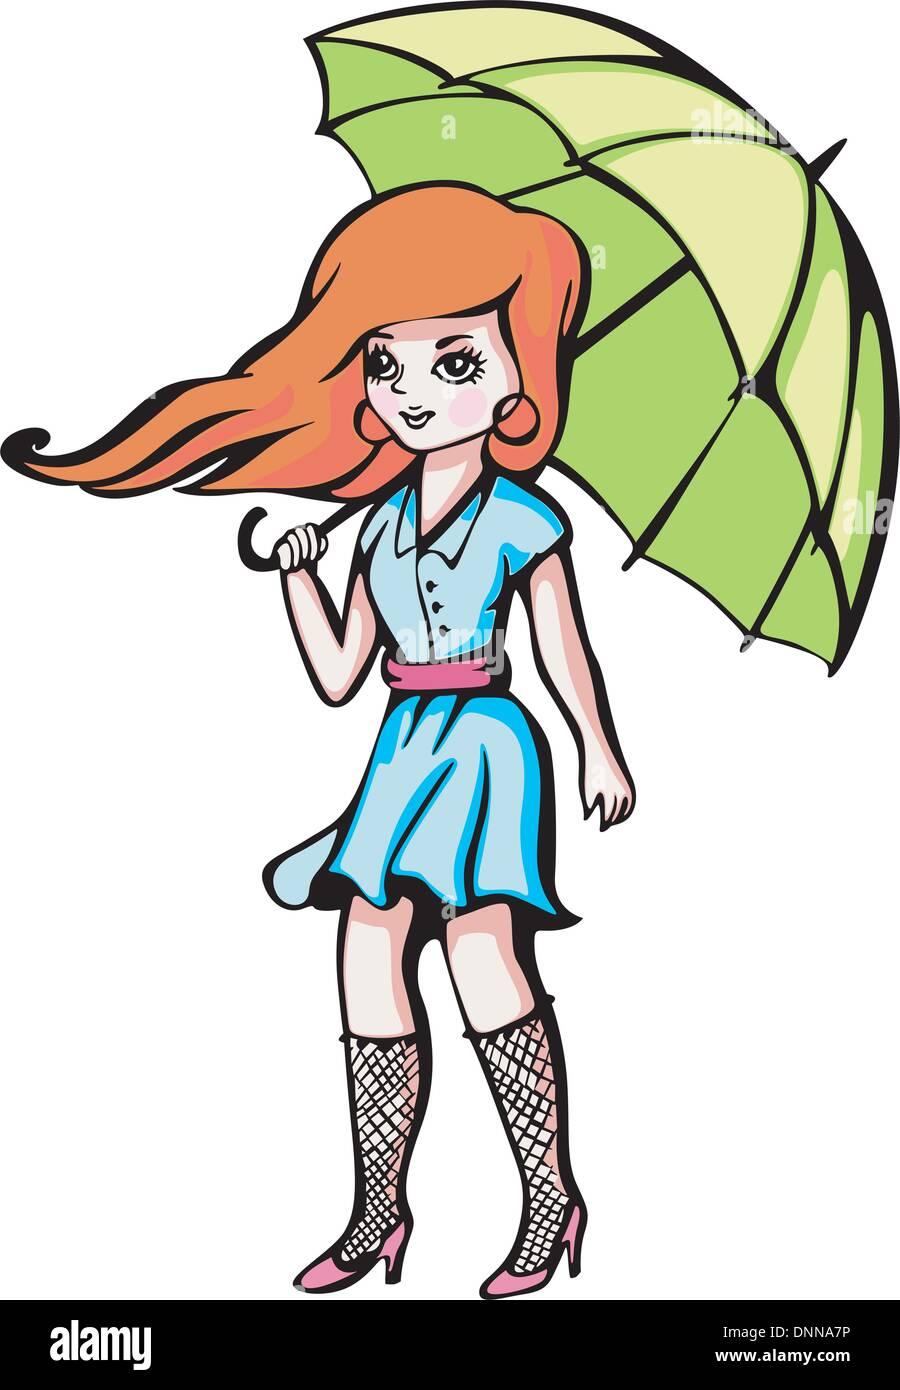 Junges Mädchen mit Regenschirm. Farbe-Vektor-Illustration. Stockbild